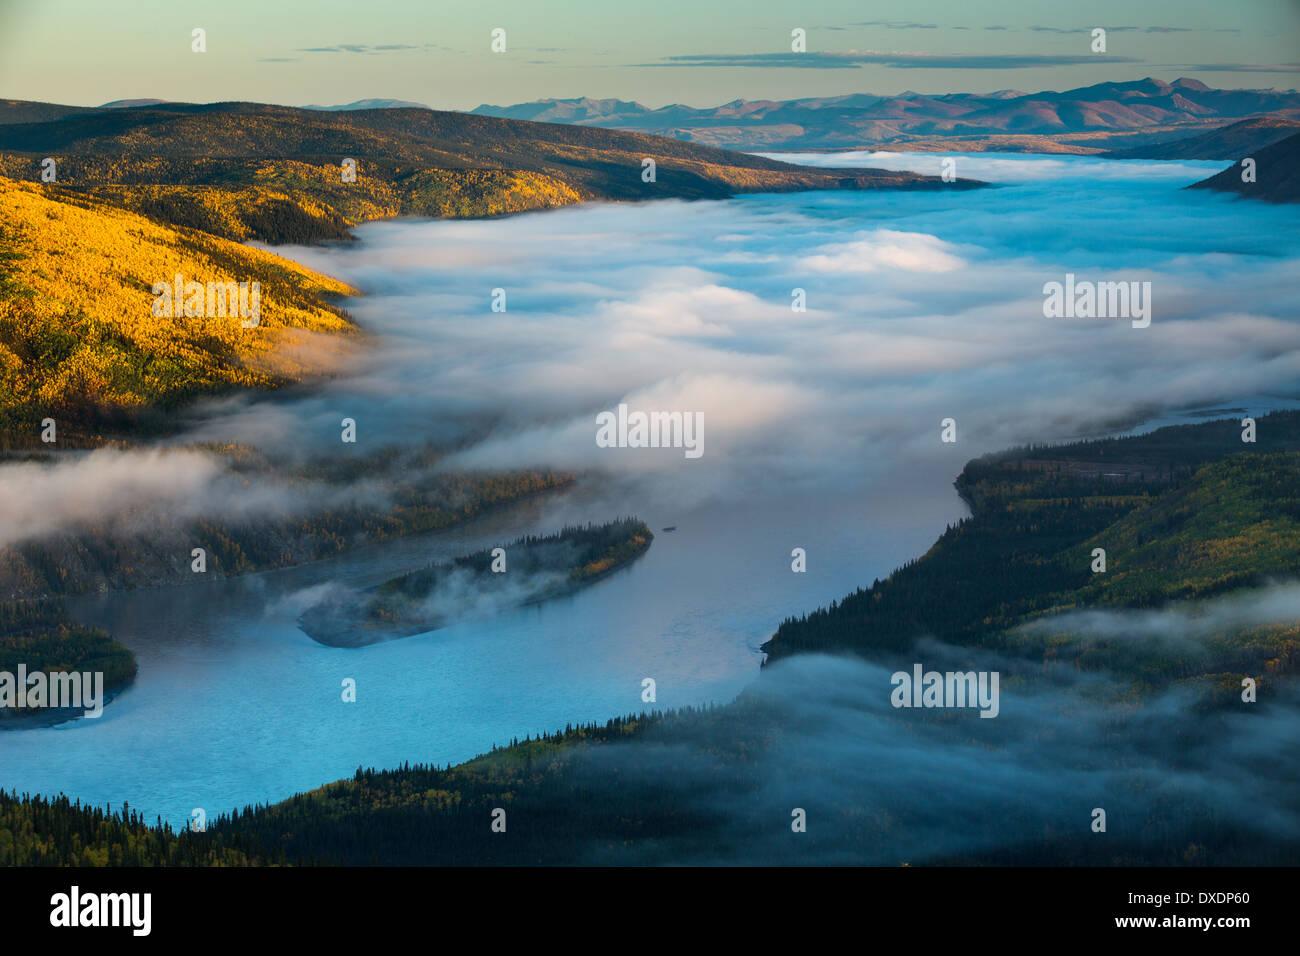 Brouillard dans la vallée du fleuve Yukon, à l'aube, en aval de Dawson City de Dome Hill, Territoire du Yukon, Canada Photo Stock